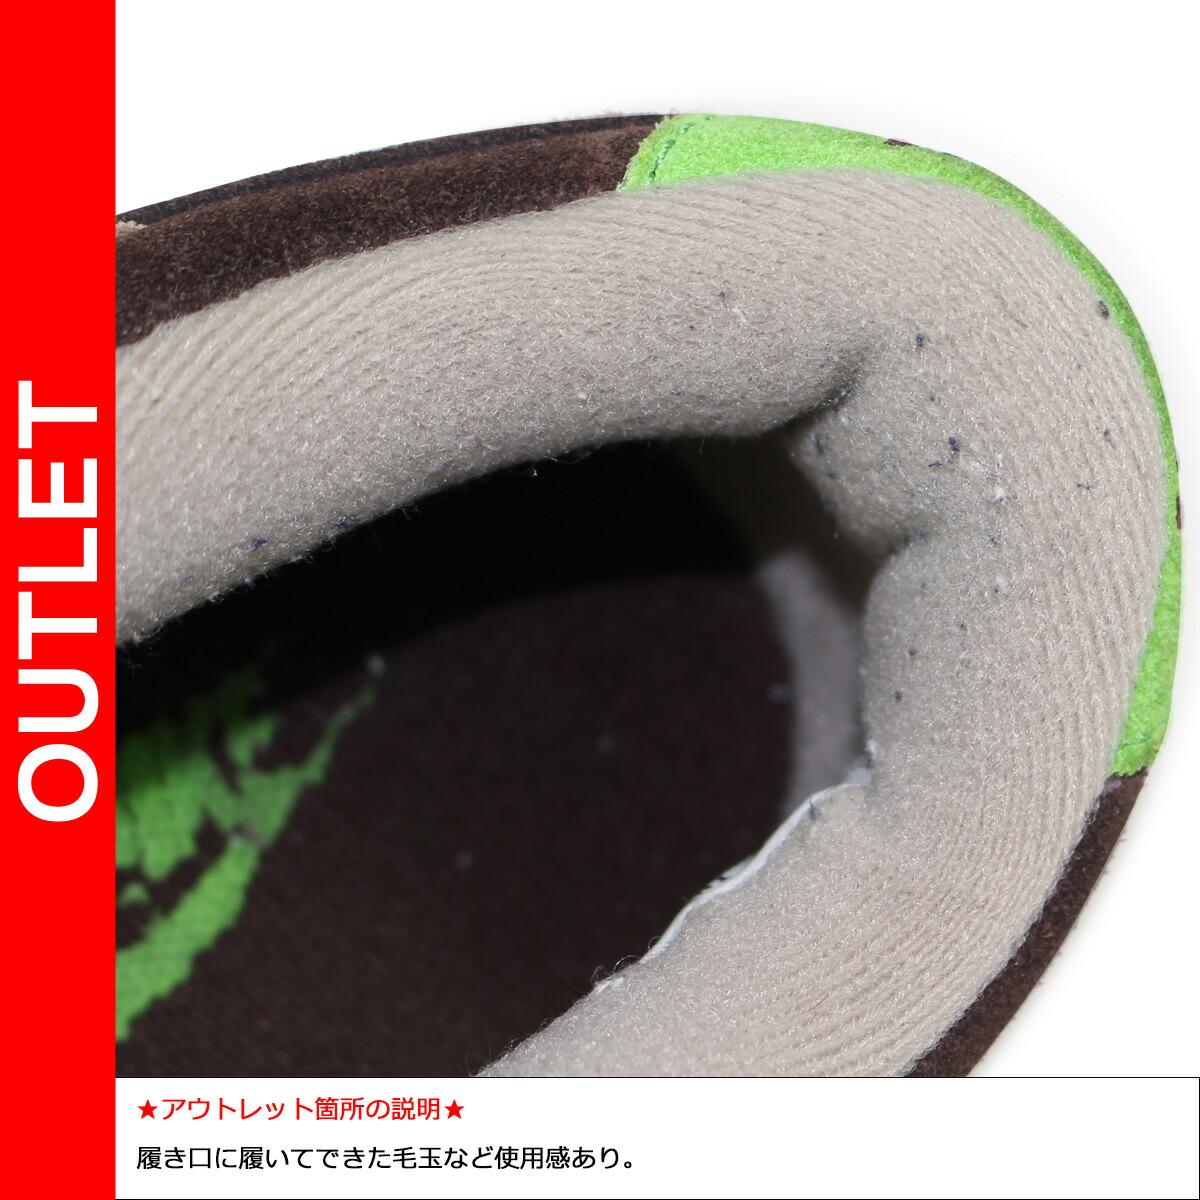 new products fc0cf 74e99 訳あり ナイキ NIKE ダンク スニーカー メンズ DUNK LOW KICKS HAWAII 804609-102 カーキ  zzi返品不可